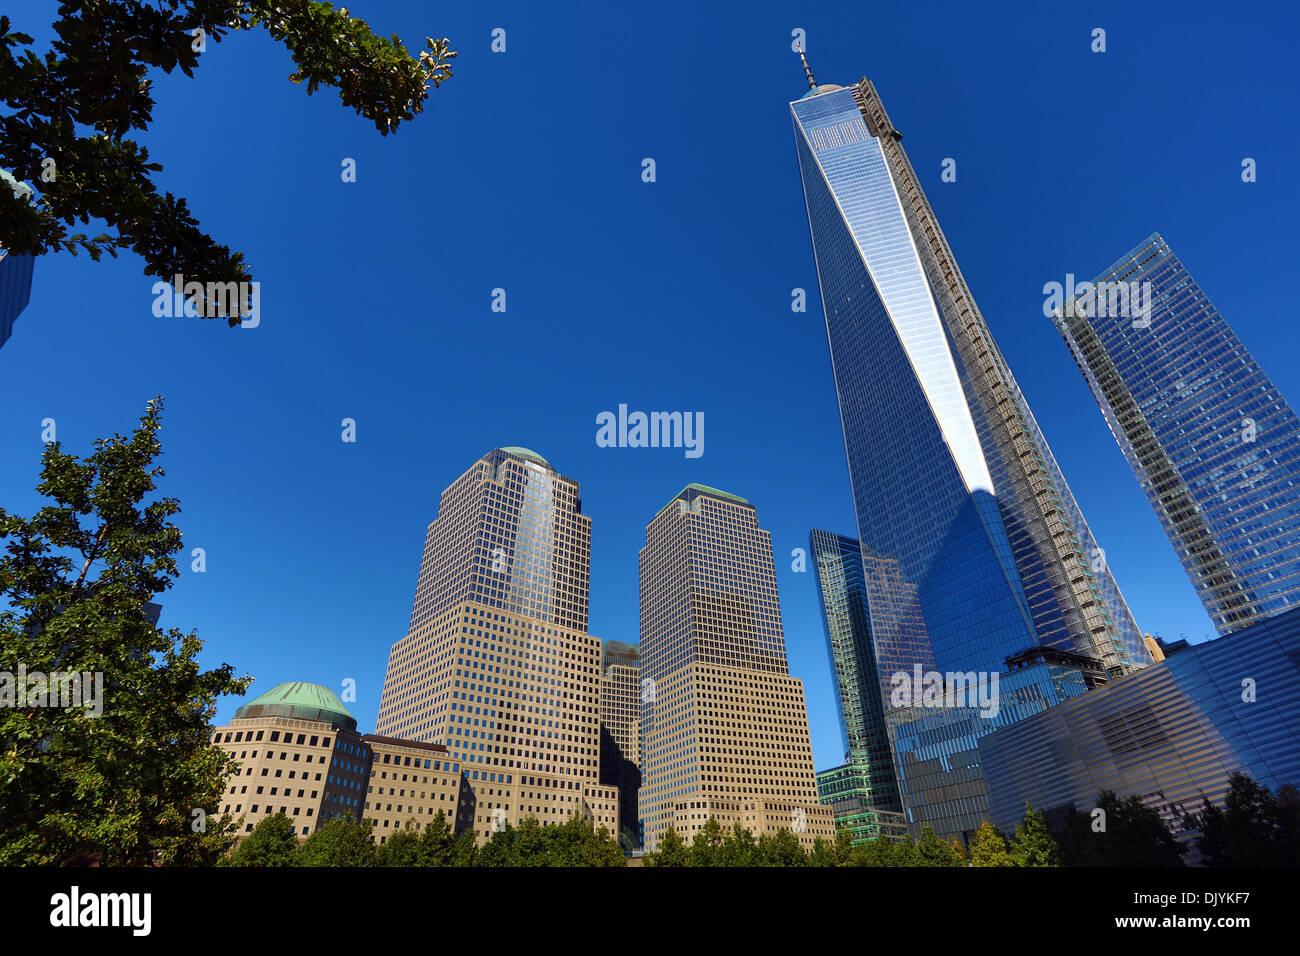 One World Trade Center ( 1 WTC ) building in the new World Trade Centre Complex, New York. America - Stock Image